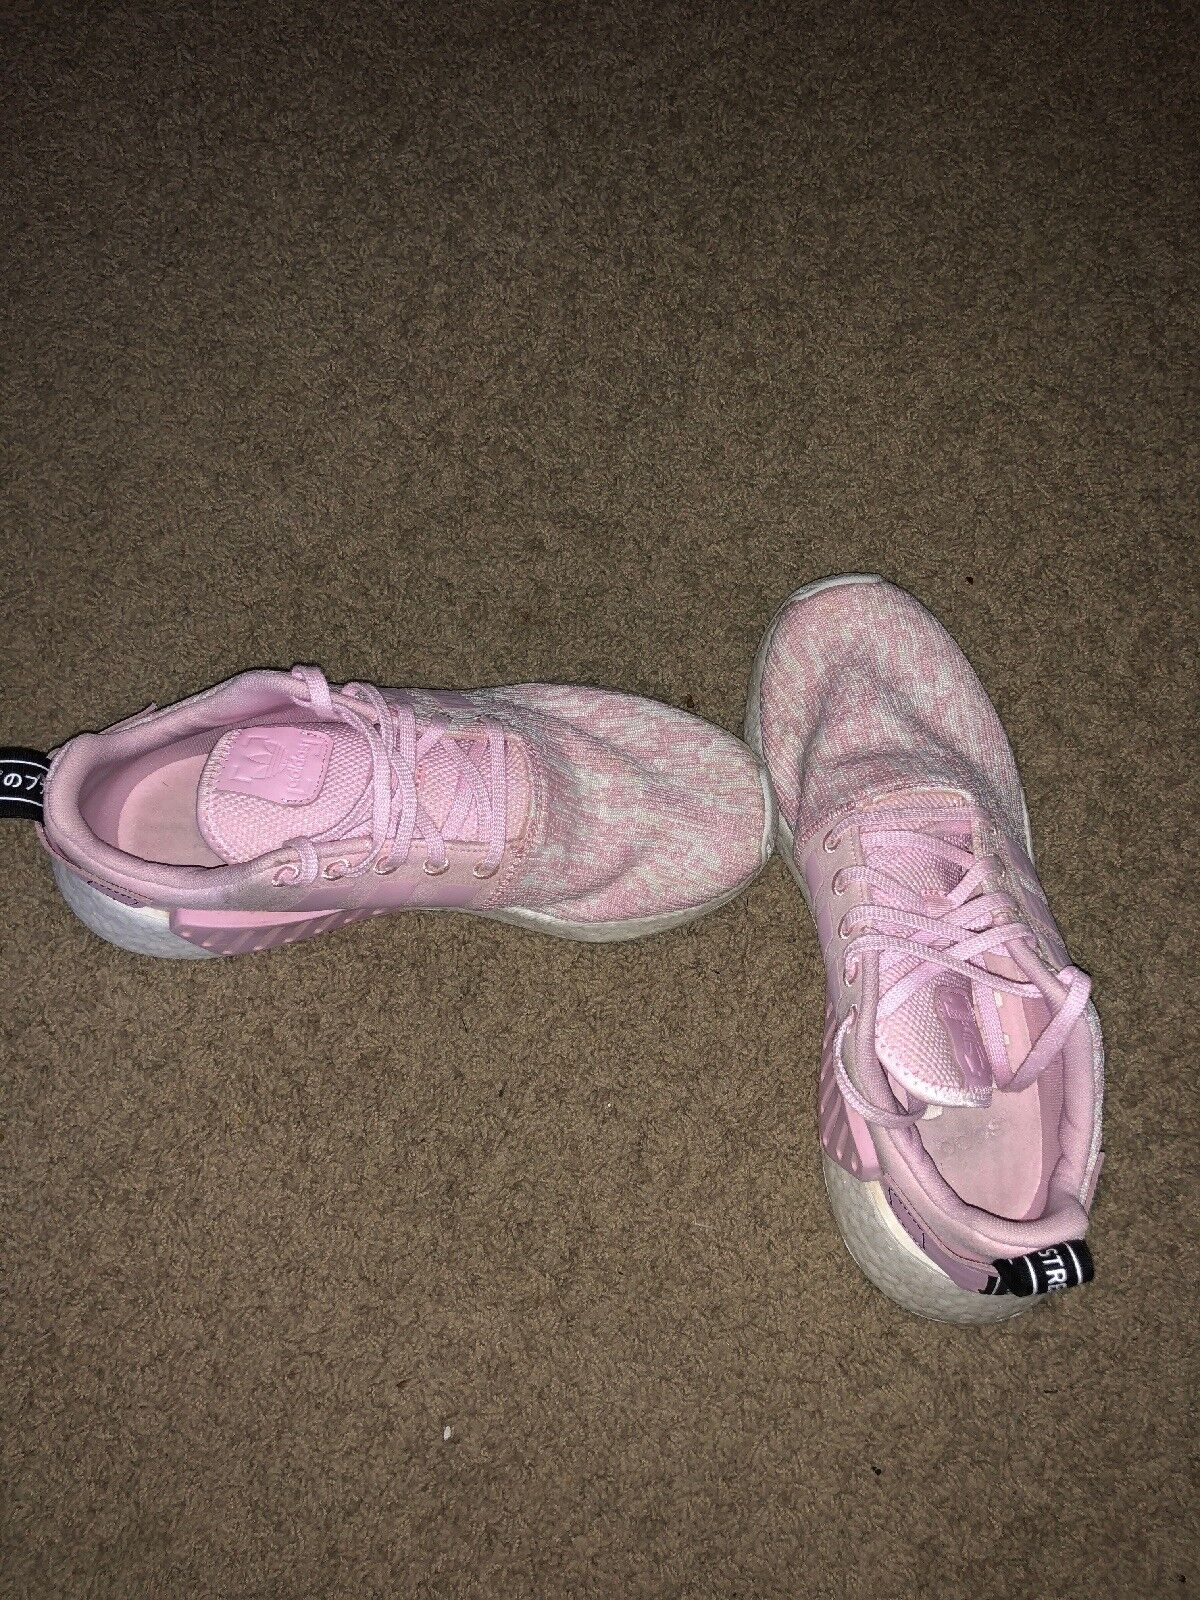 Adidas NMD R2 Wonder Pink Women's Tennis shoes